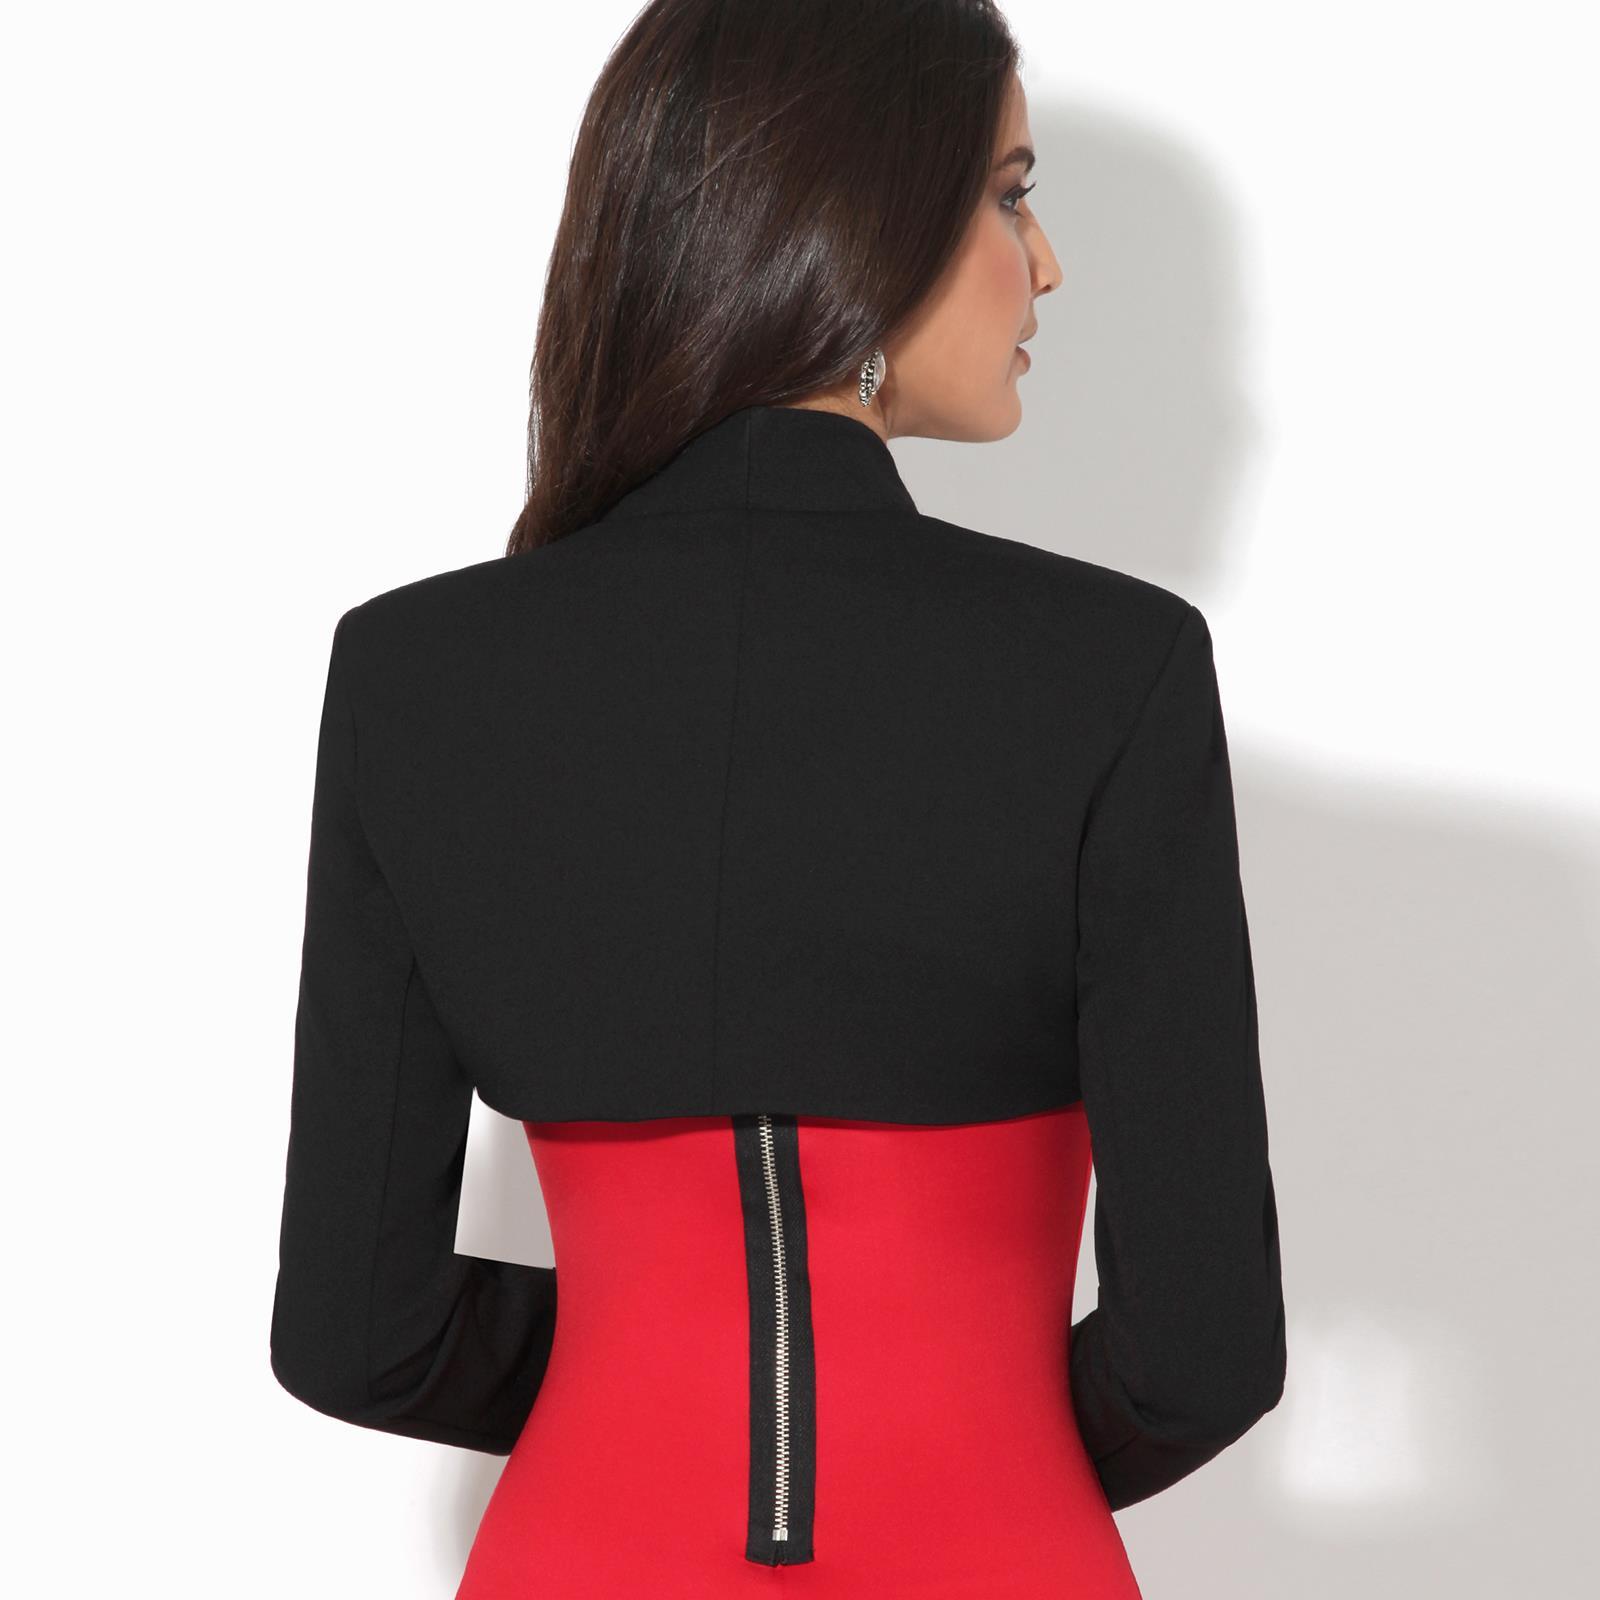 Femmes-Veste-Courte-Bolero-Blazer-Jacket-Manche-3-4-Gilet-Cardigan-Cache-Epaule miniature 9